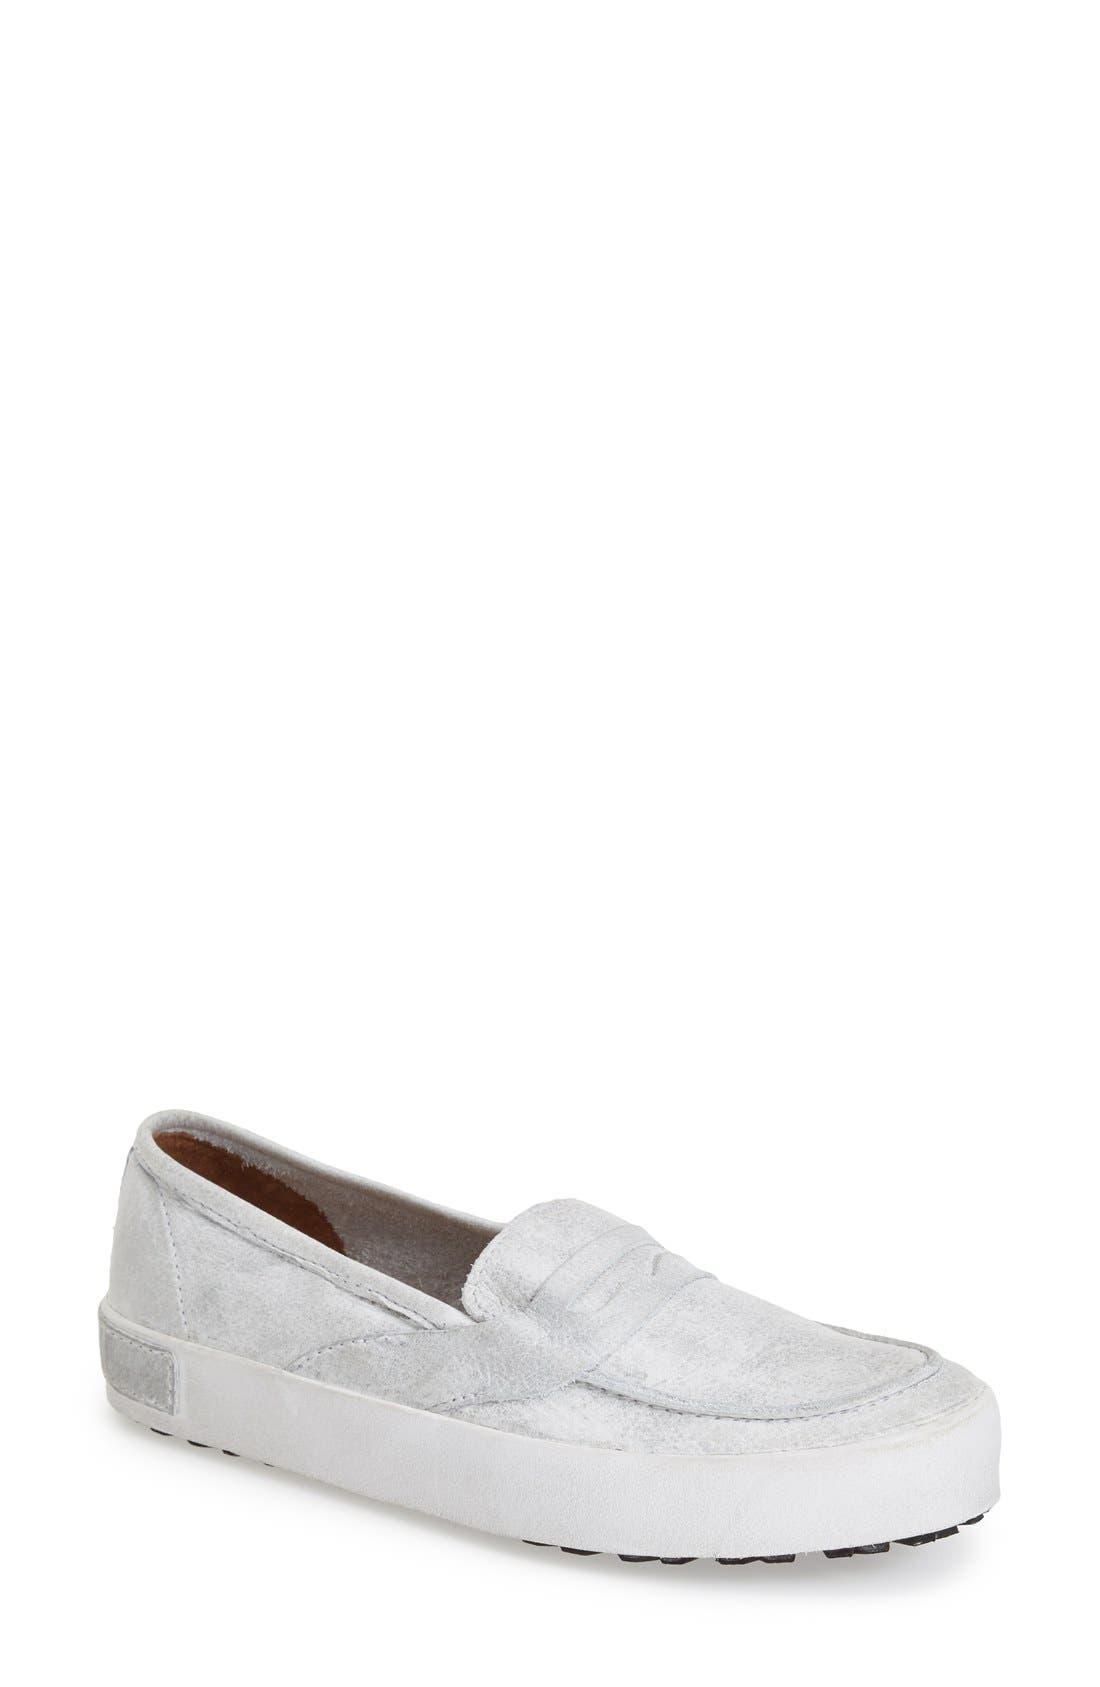 Alternate Image 1 Selected - Blackstone 'JL23' Slip-On Sneaker (Women)